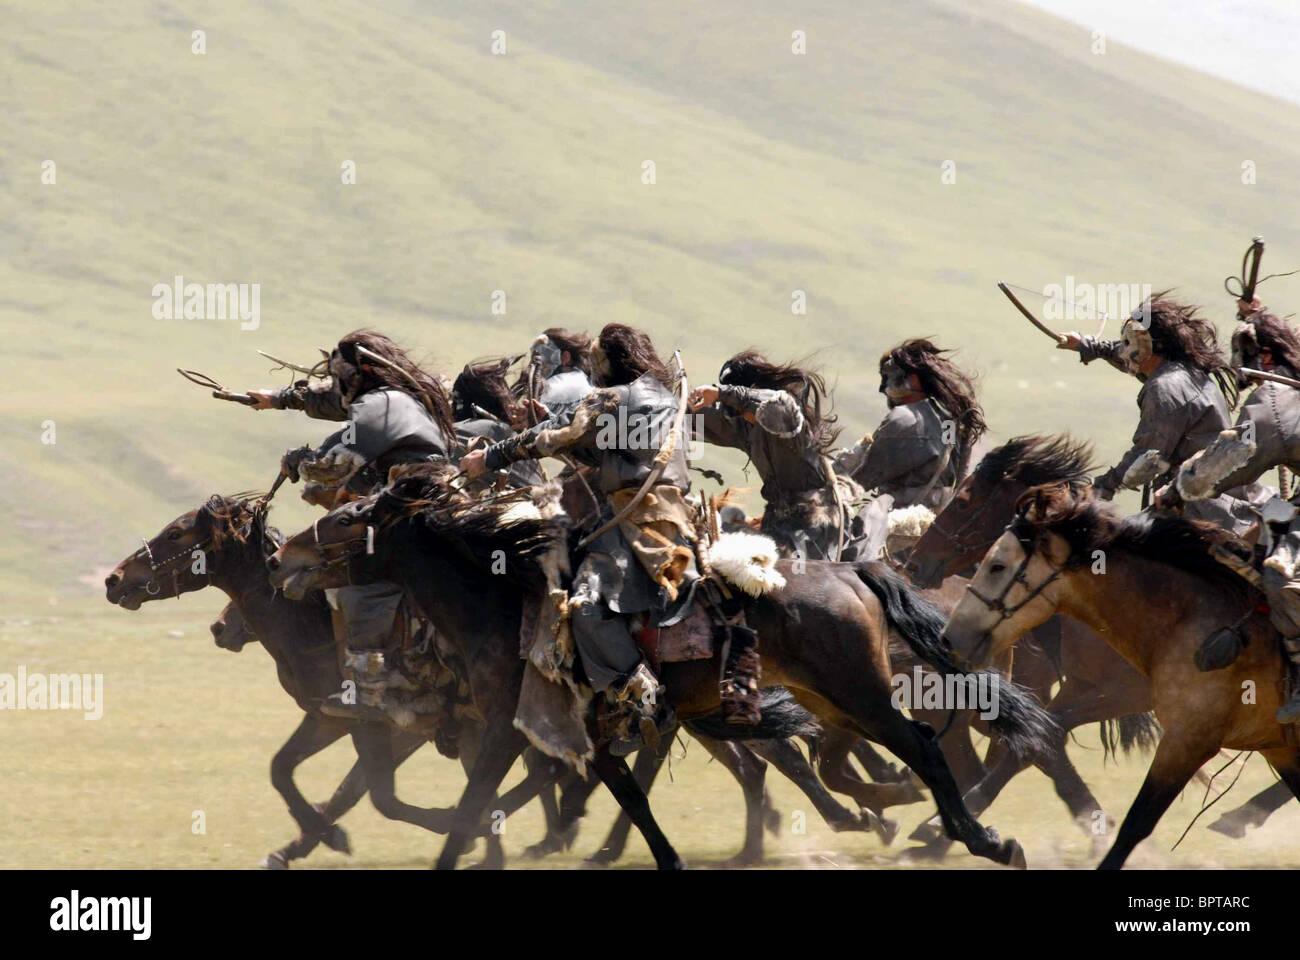 HORSEMEN CHARGE MONGOL (2007) - Stock Image